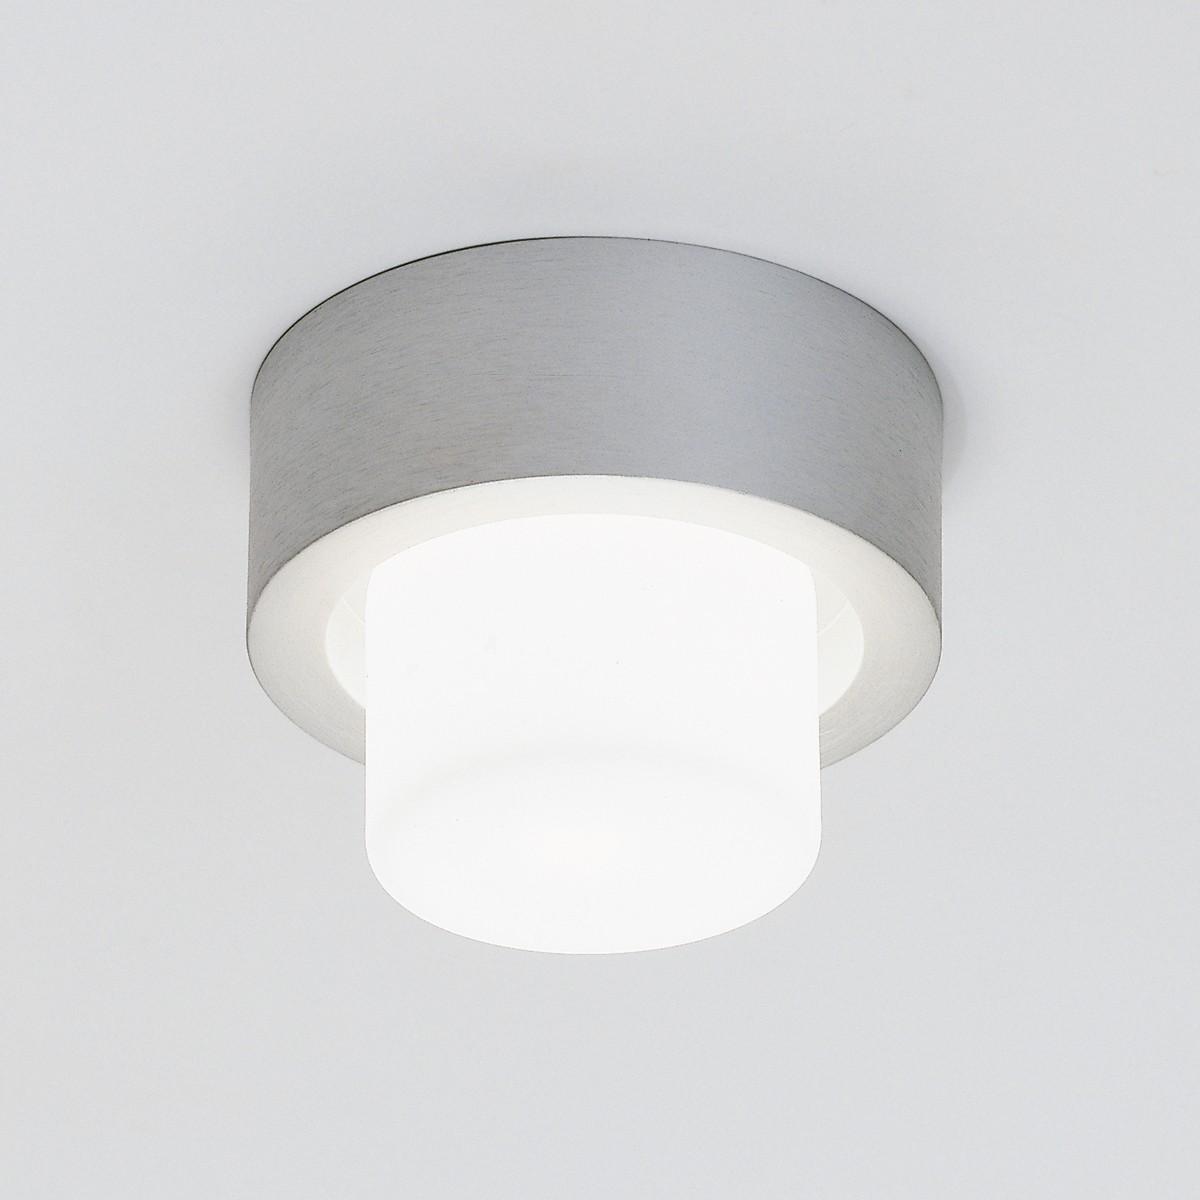 Milan Mini Rondo Wand- / Deckenleuchte, Aluminium satiniert